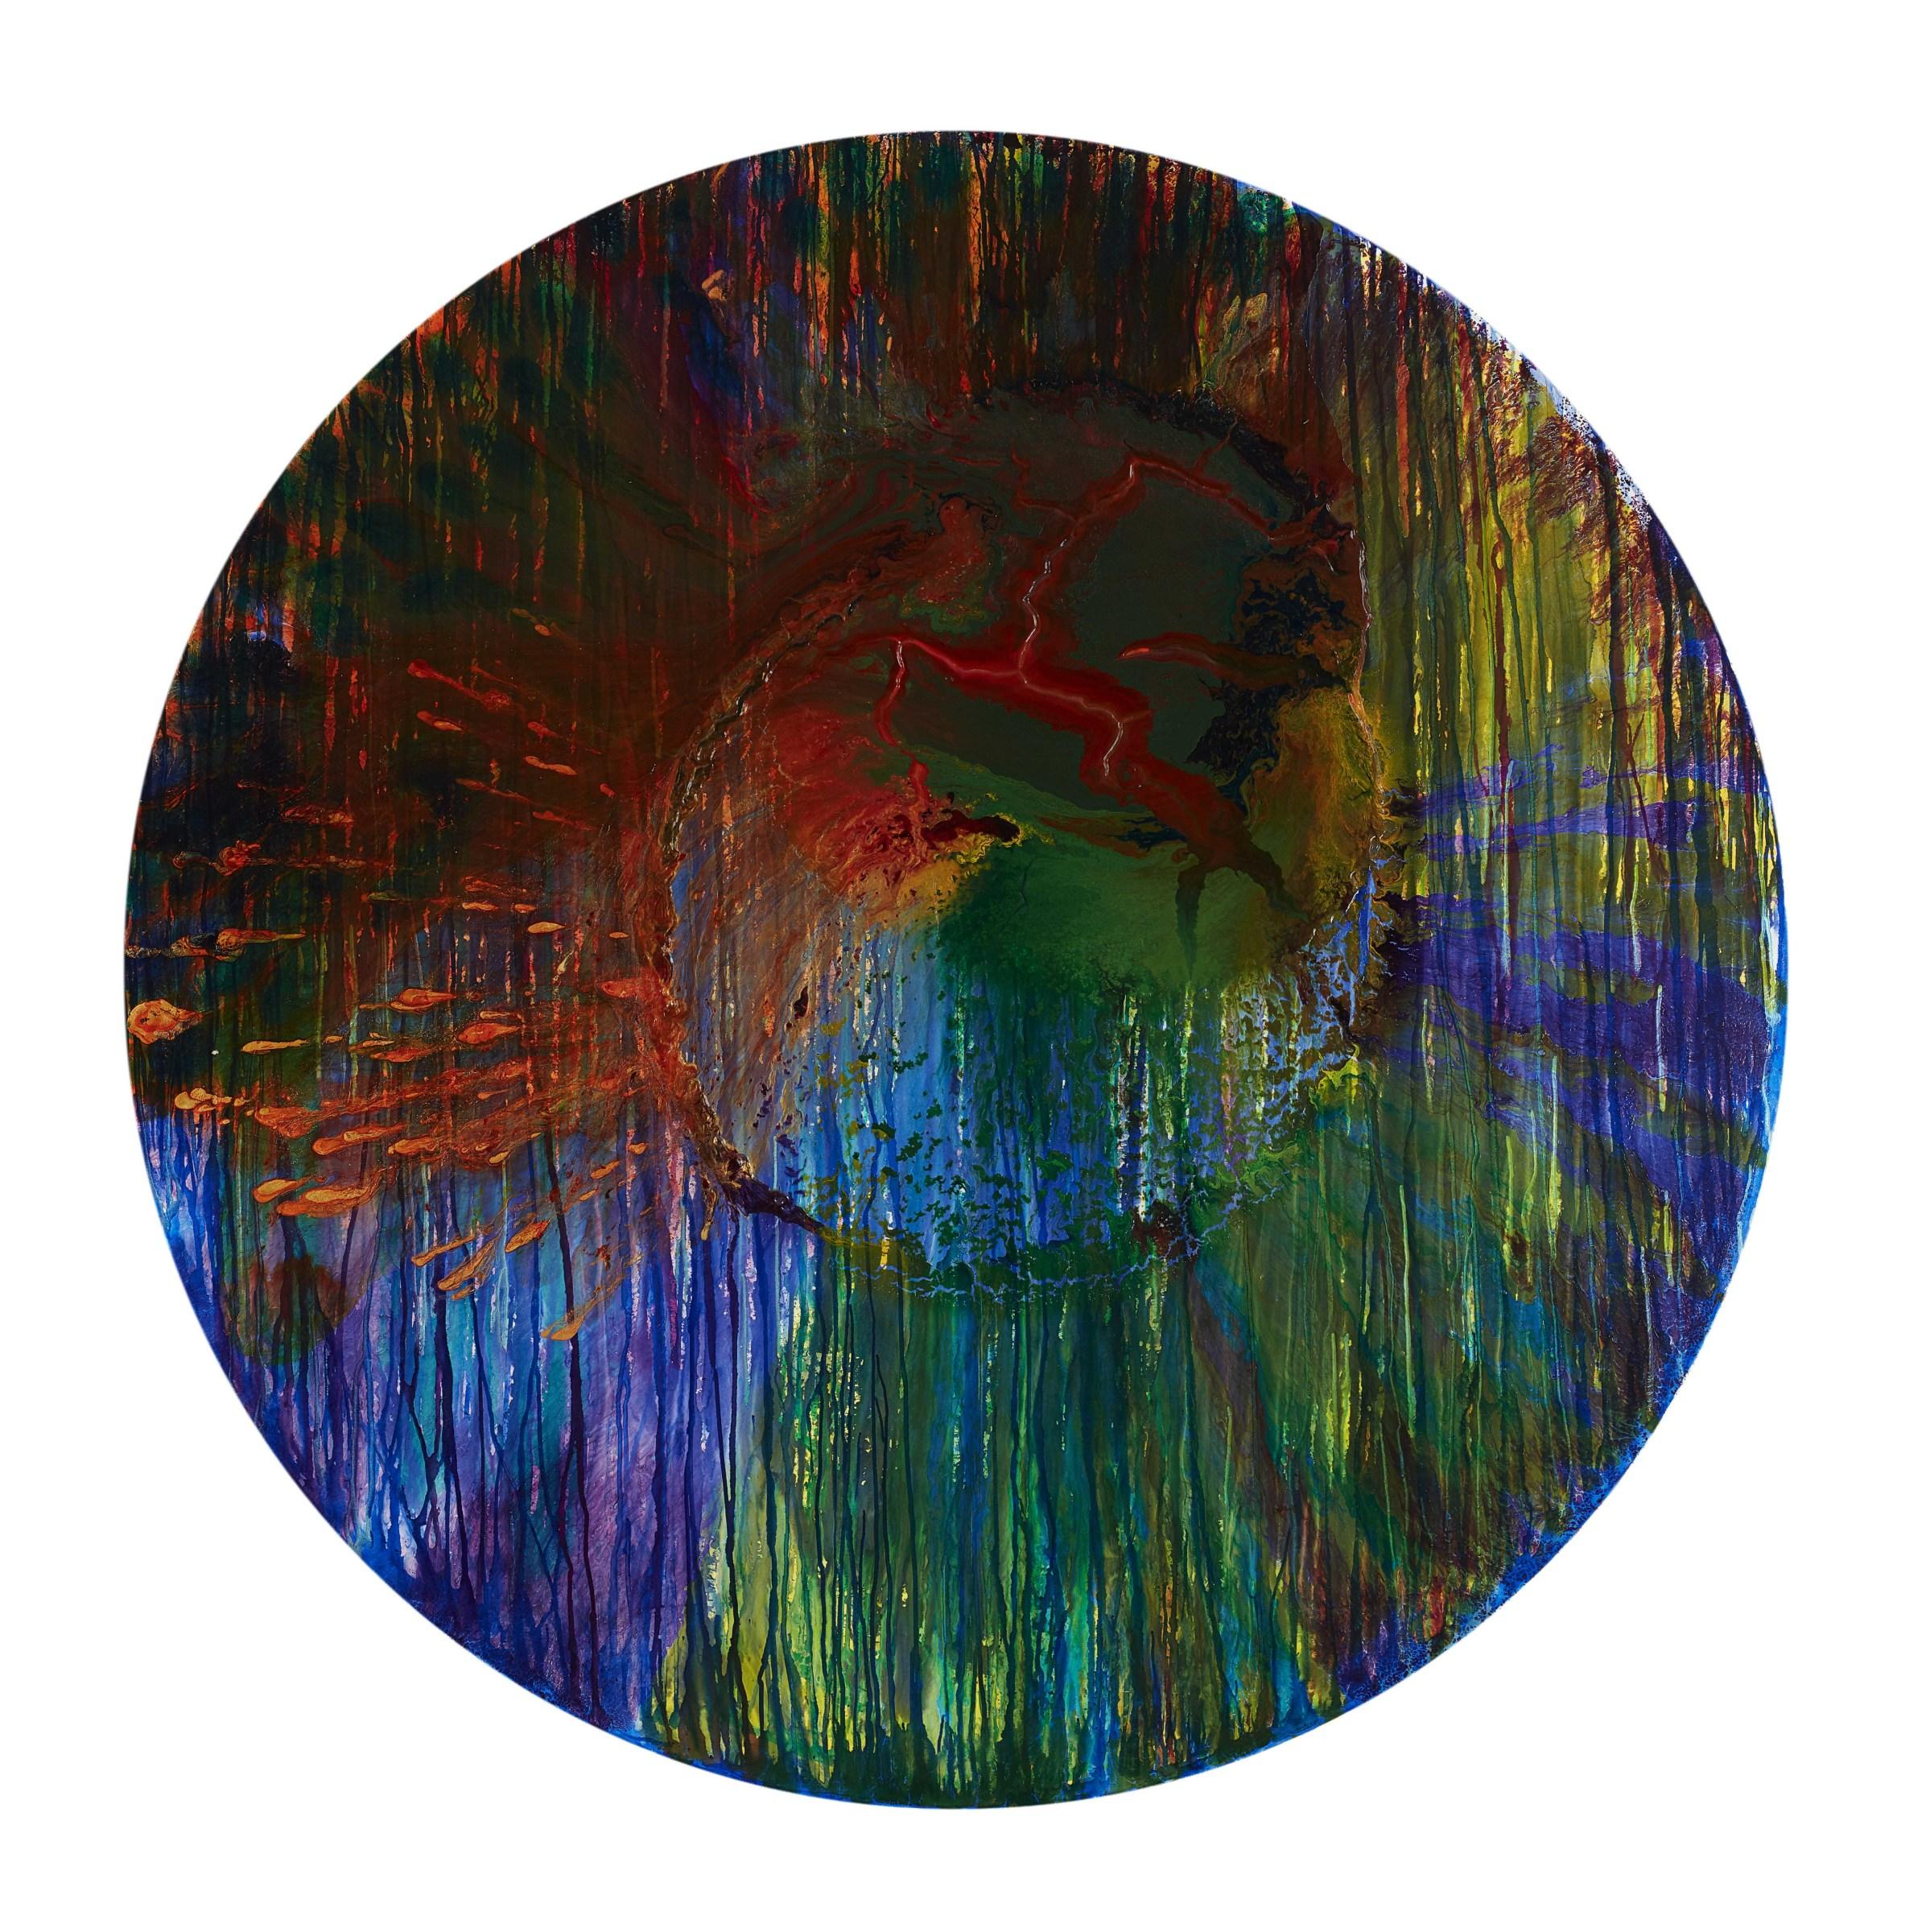 <span class=&#34;link fancybox-details-link&#34;><a href=&#34;/artists/66-elsa-duault/works/6715-elsa-duault-texture-and-time-1-2018/&#34;>View Detail Page</a></span><div class=&#34;artist&#34;><strong>Elsa Duault</strong></div> <div class=&#34;title&#34;><em>Texture and Time 1</em>, 2018</div> <div class=&#34;medium&#34;>Ink and Transparent Coat on Canvas</div> <div class=&#34;dimensions&#34;>Unframed Diameter: 180cm</div>